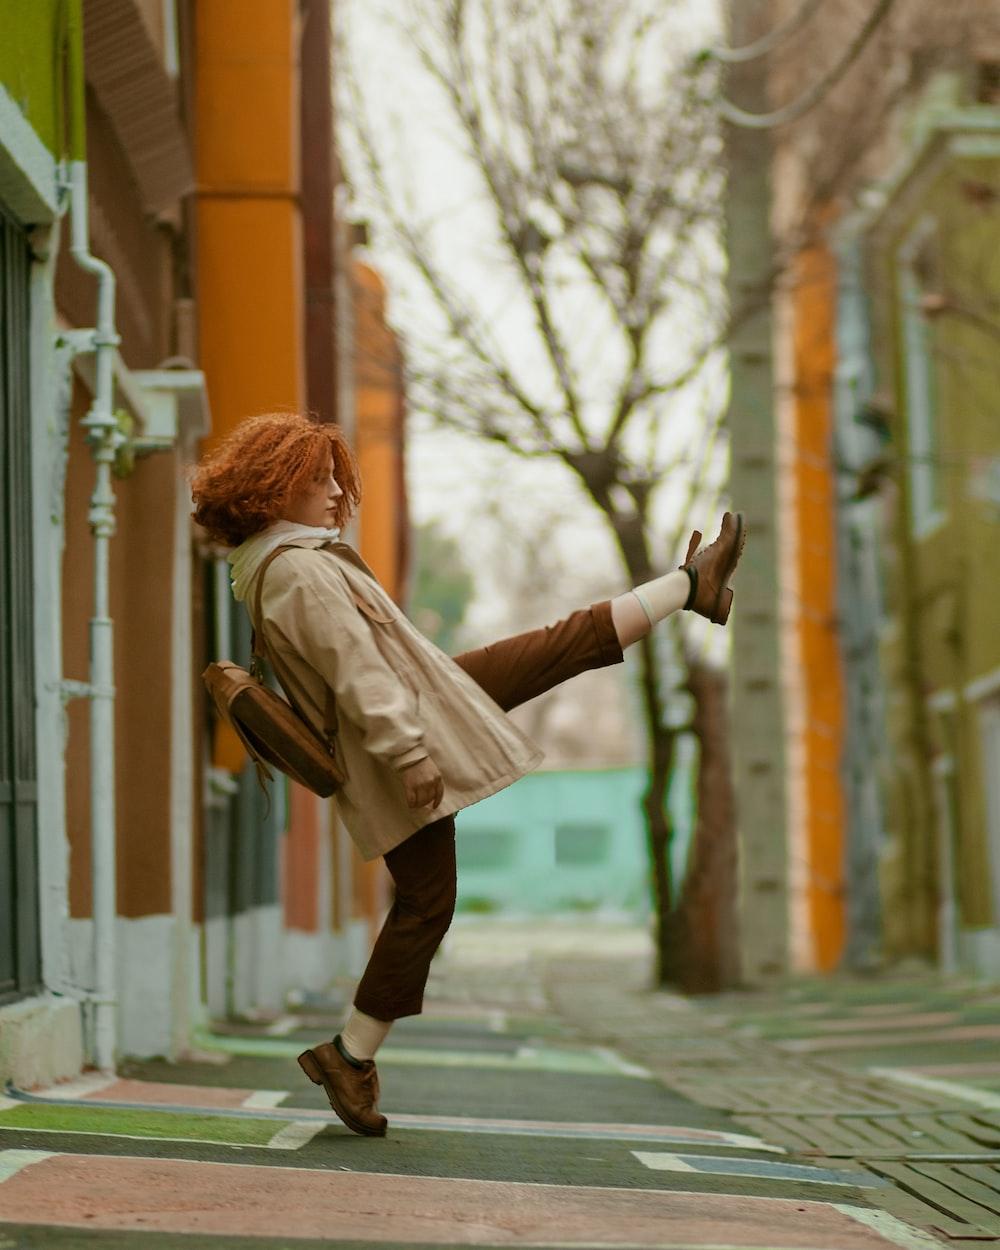 woman in brown jacket and black pants walking on sidewalk during daytime